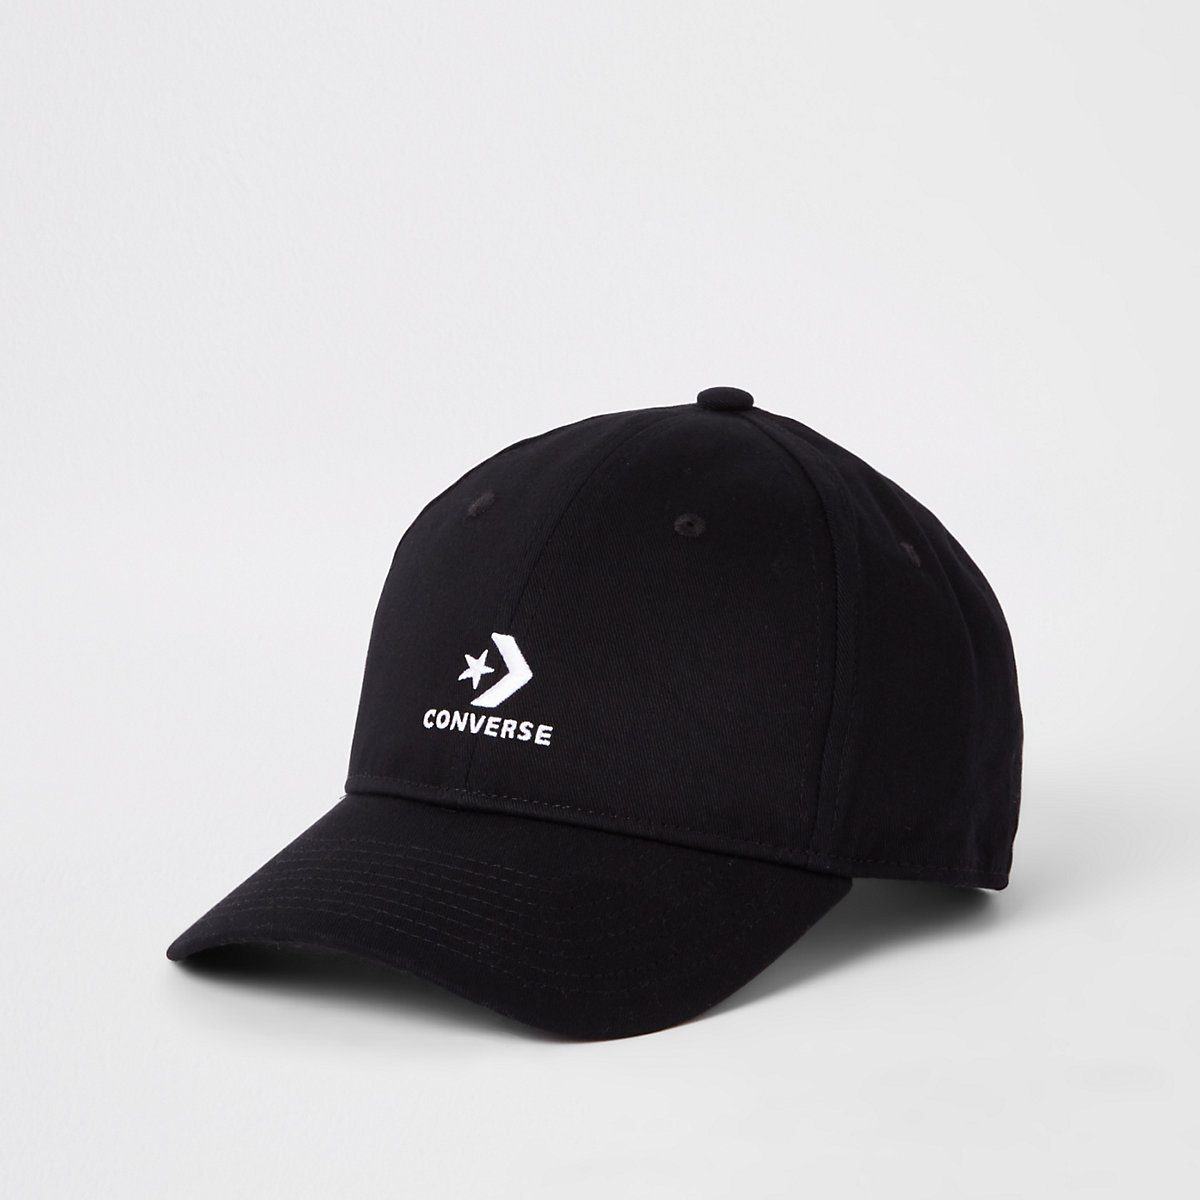 Boys Converse black cap